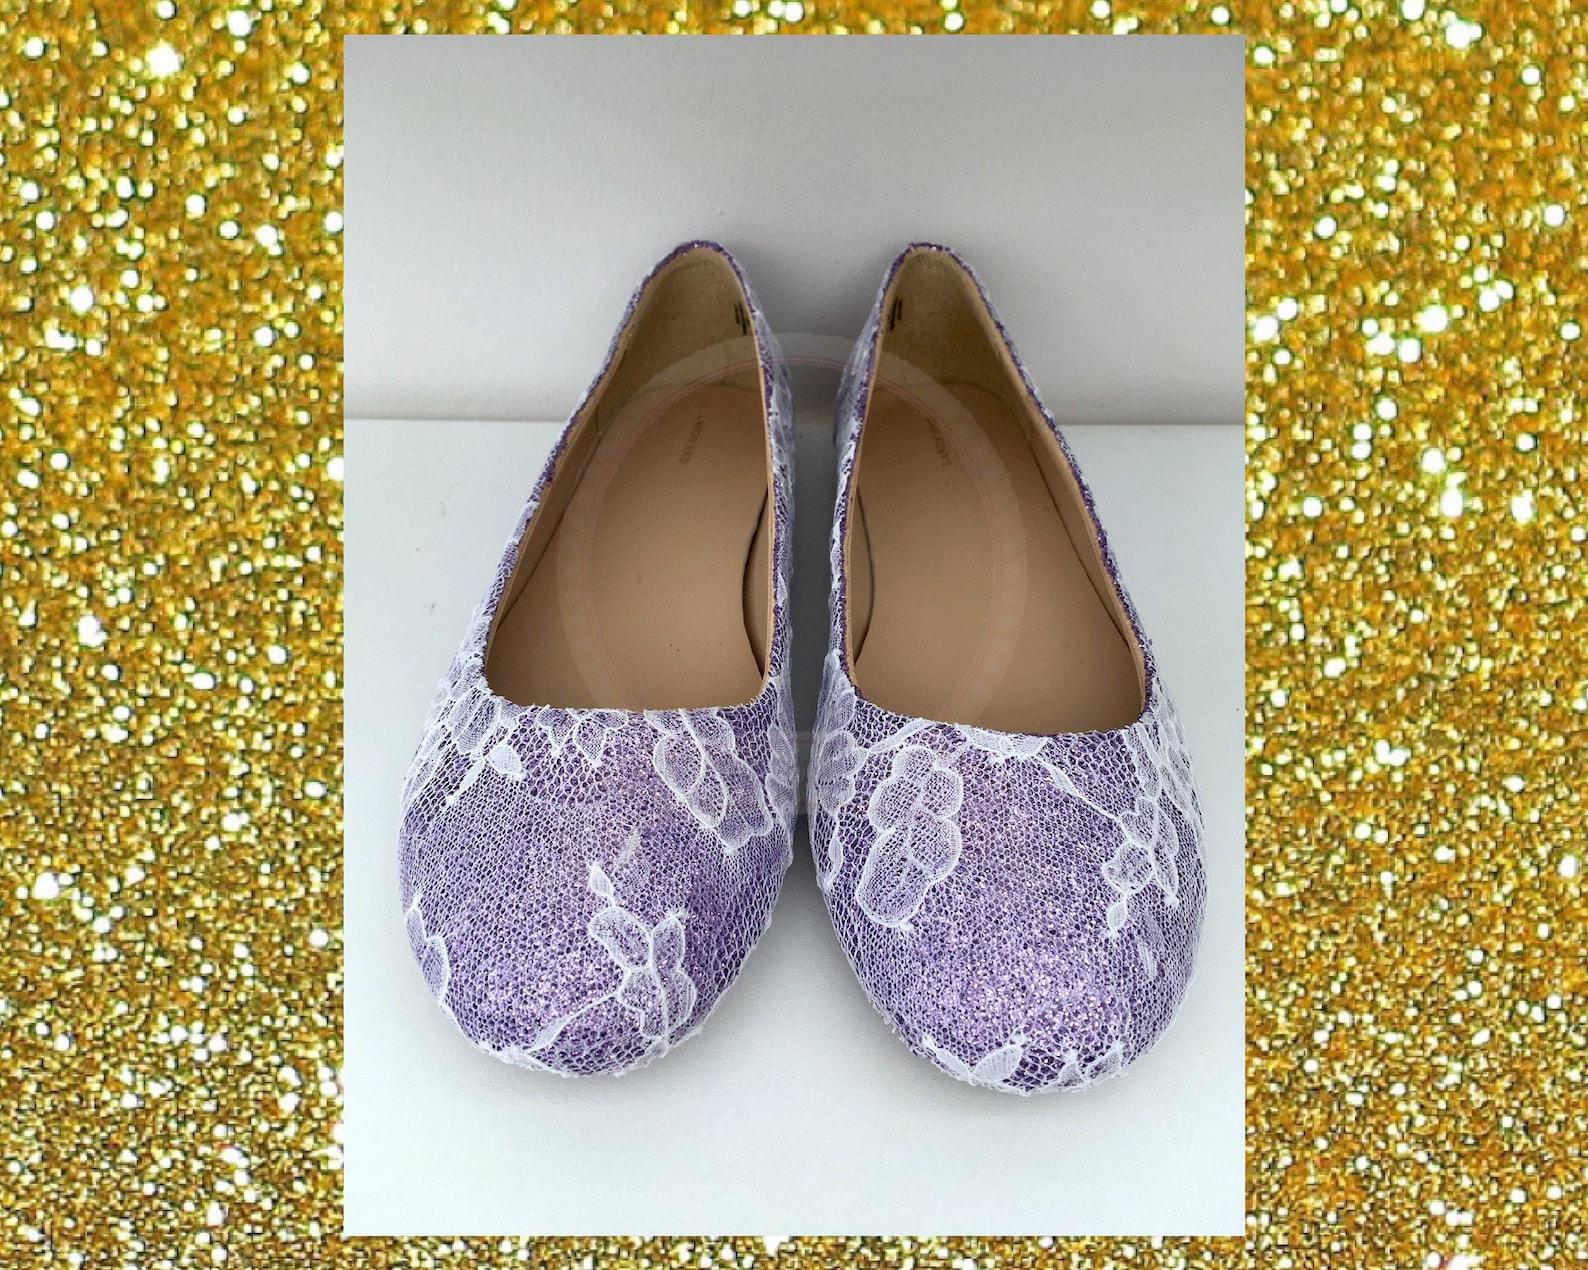 lace wedding shoes, flat wedding shoes, lilac wedding shoes, lace flat shoes, custom wedding shoes, glitter shoes, ballet flats,